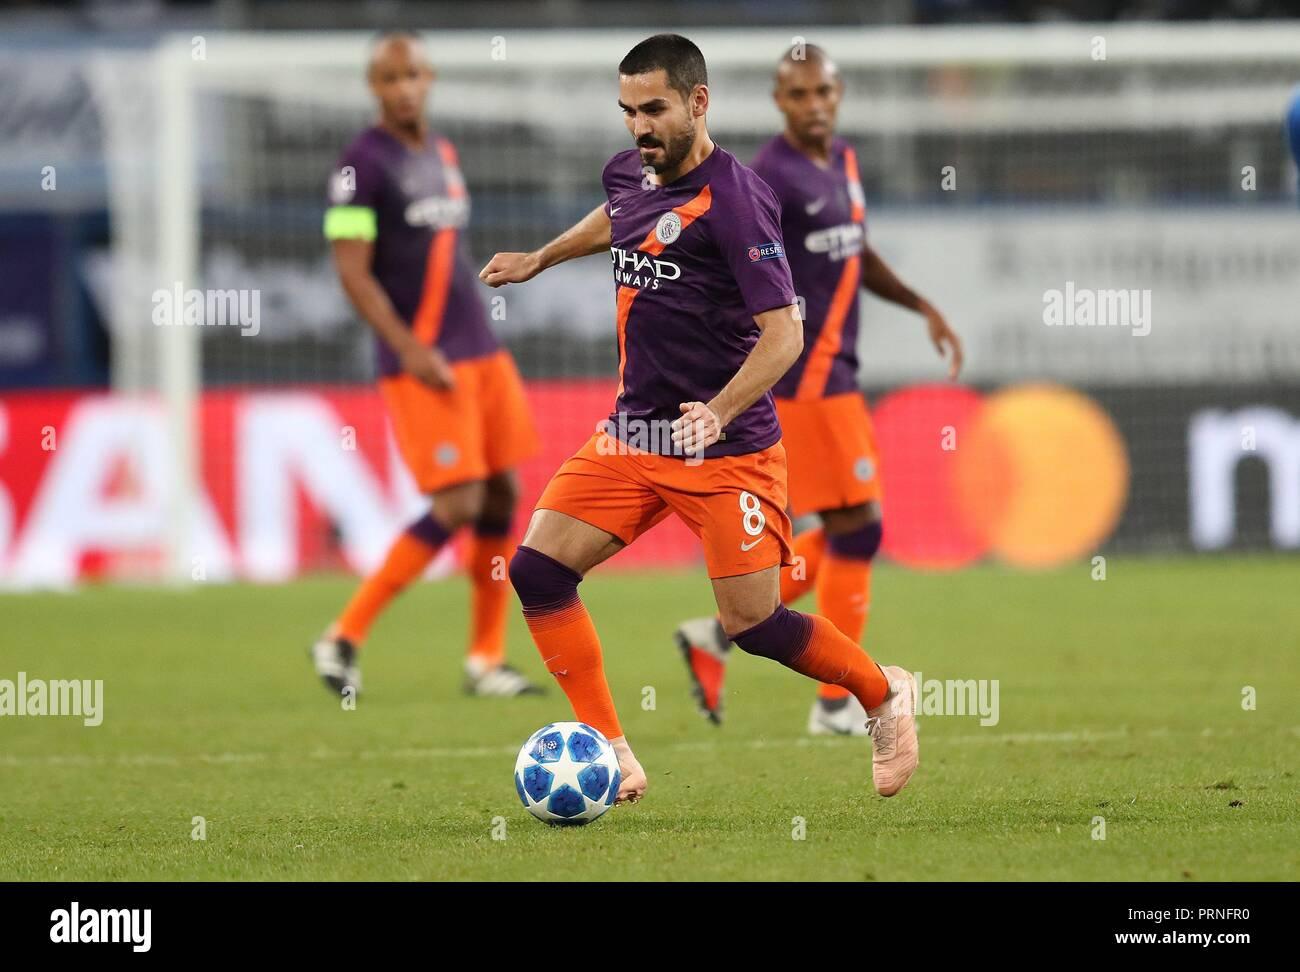 firo: 02.10.2018 Football, Football, Champions League: TSG Hoffenheim - Manchester City 1: 2 Ilkay Gundogan, single action   usage worldwide - Stock Image